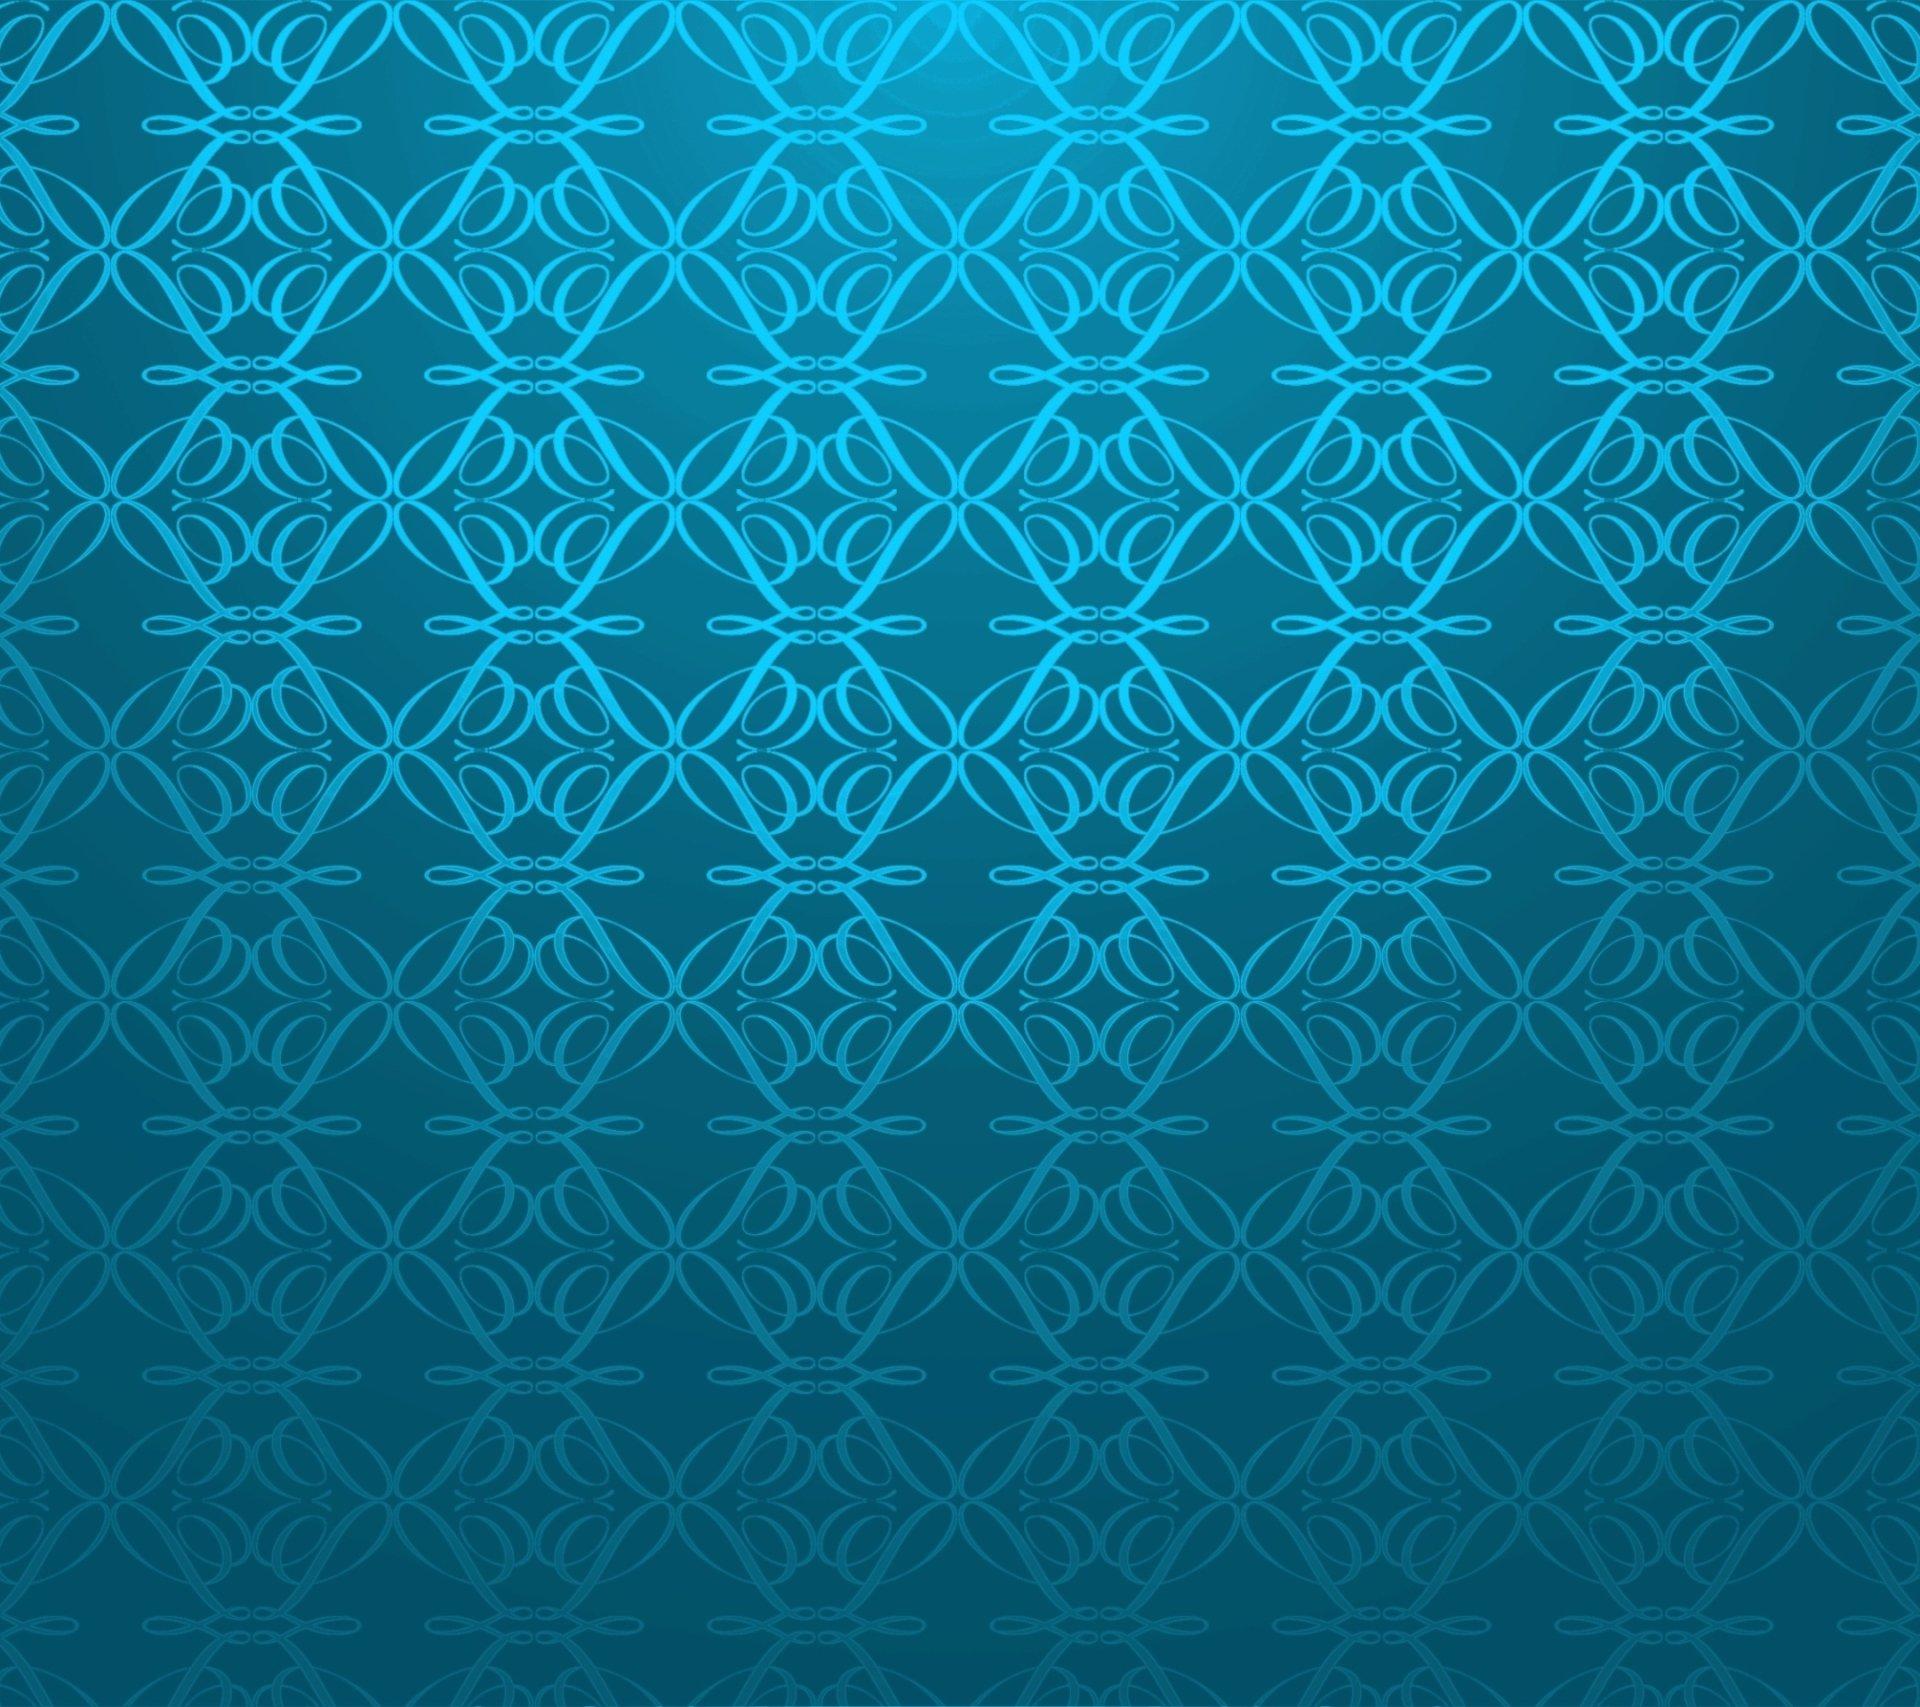 Wallpaper 740595